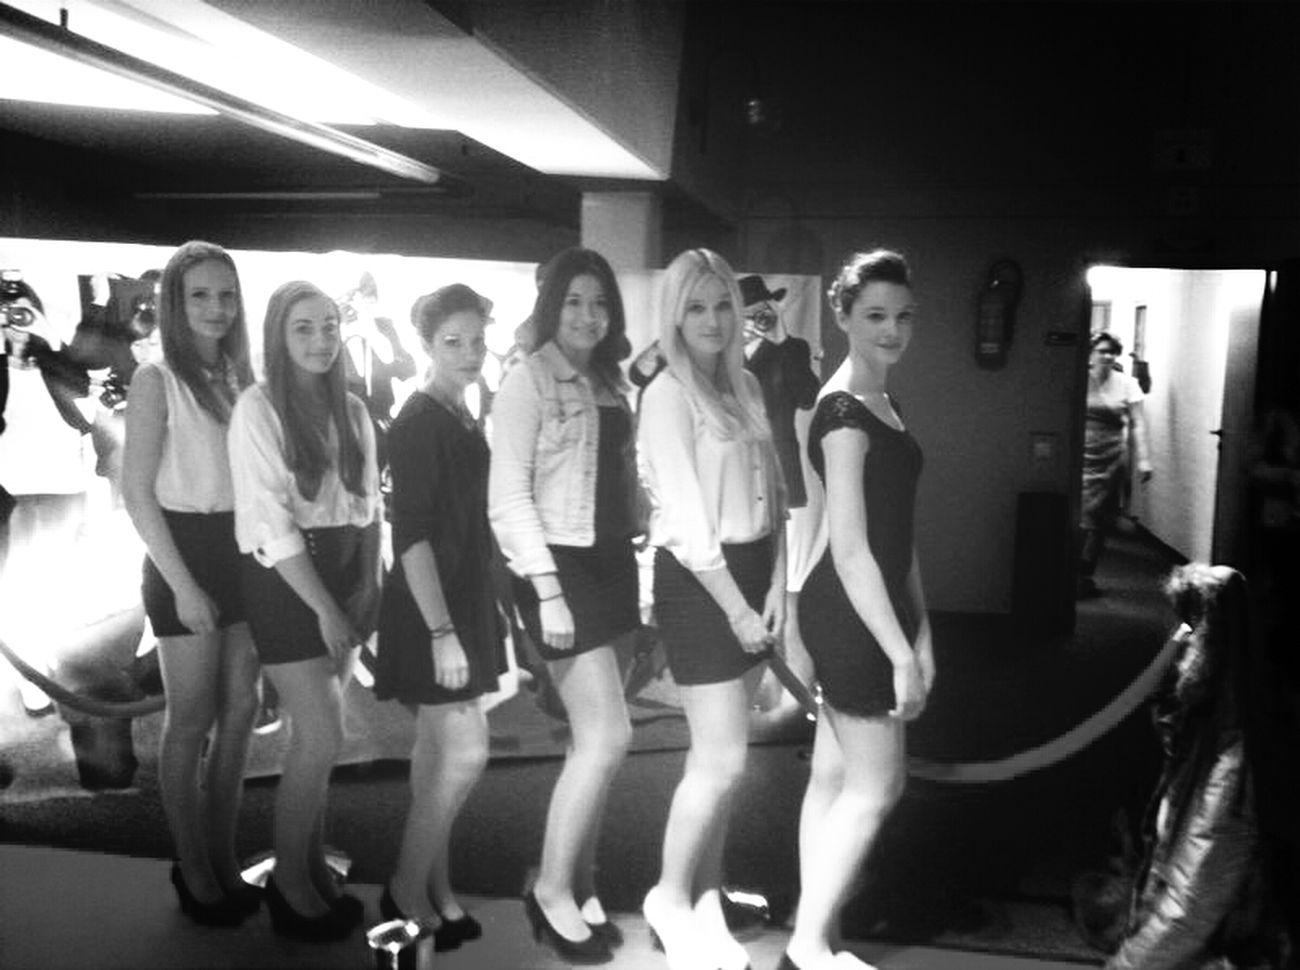 in Loveeeeeee with my girls♥♥♥